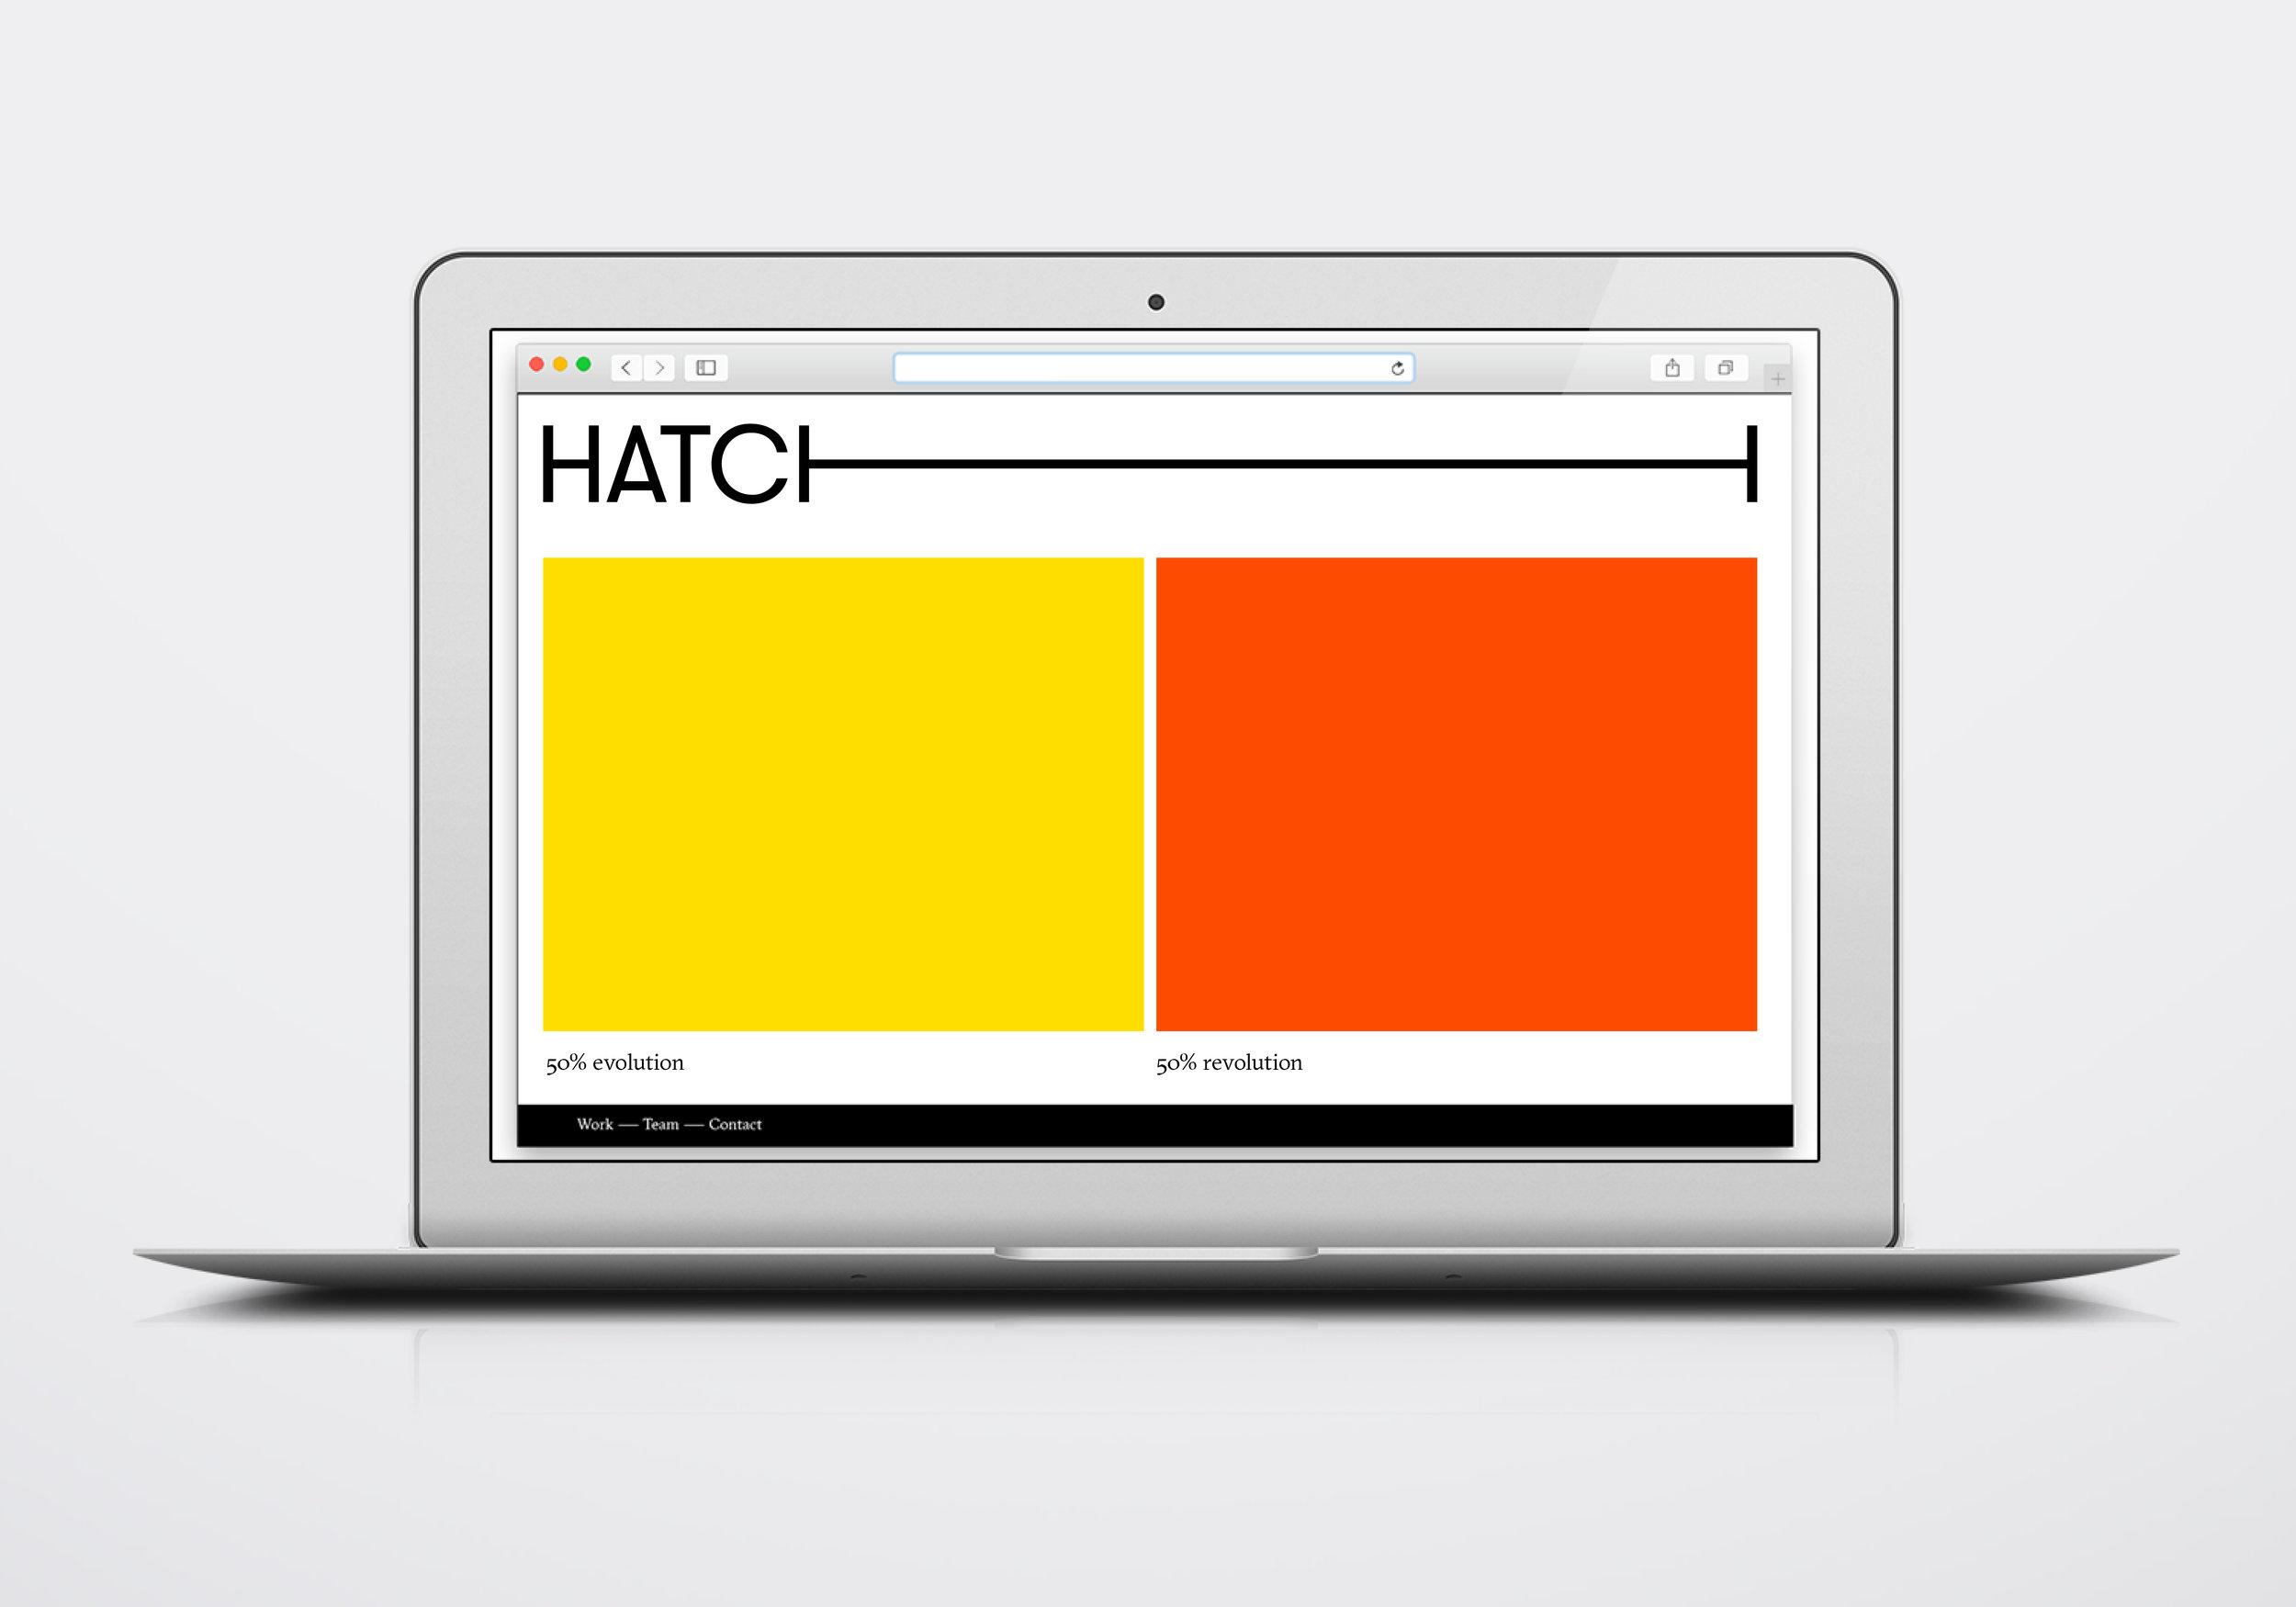 hatch-website-03.jpg